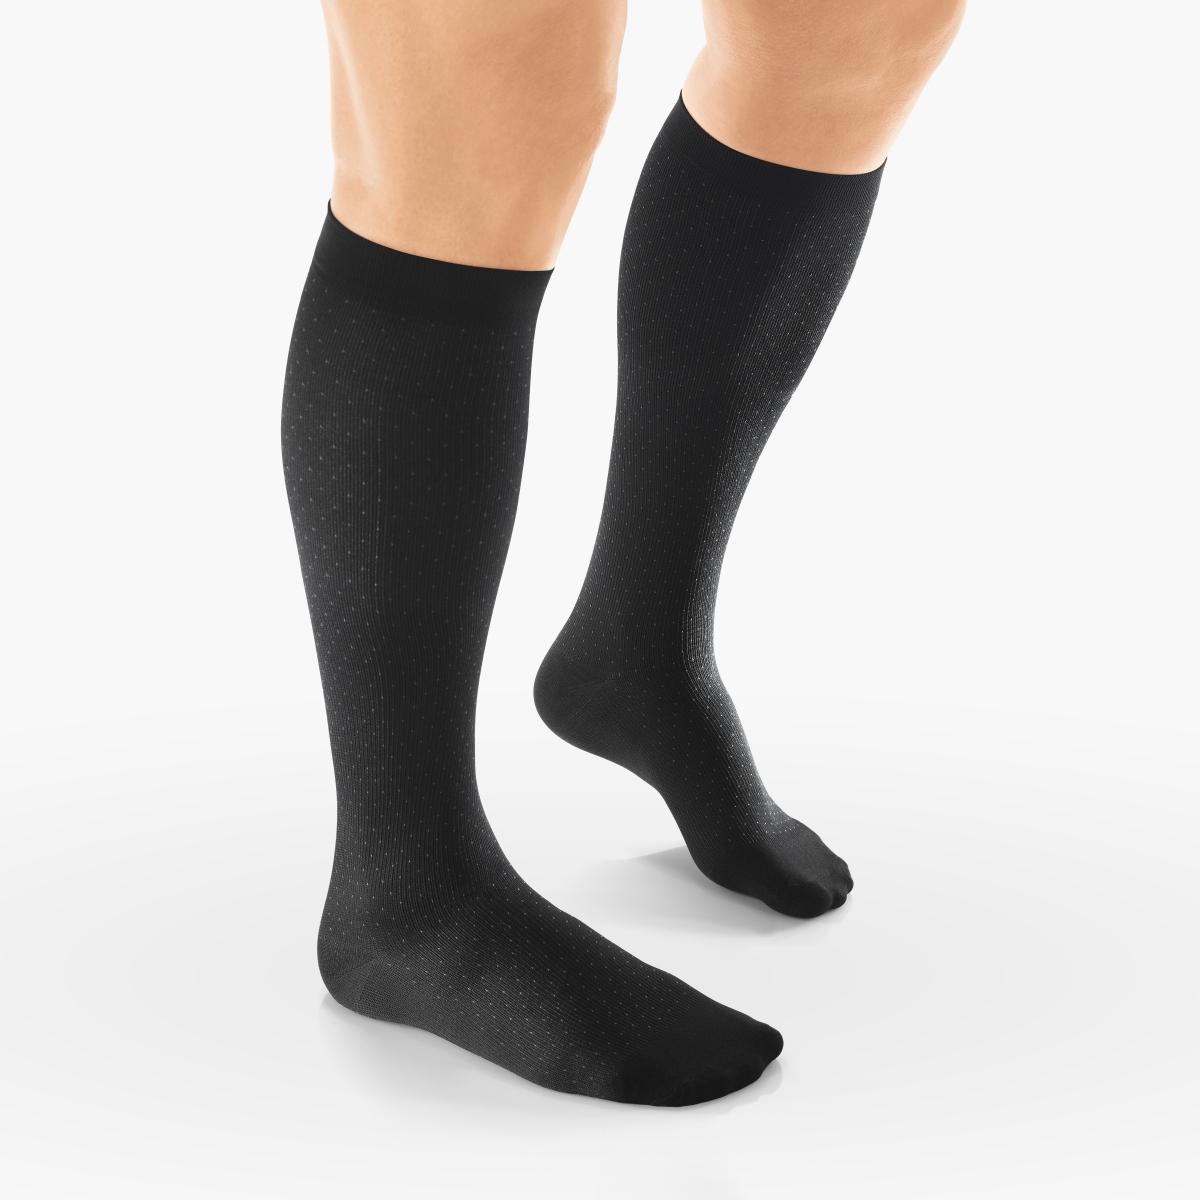 VENOSAN Sup F Men, Pin Dot,  Below Knee 15-20, Black, M Moderate 15-20 mmHg   Black   M      Closed Toe   Knit Top